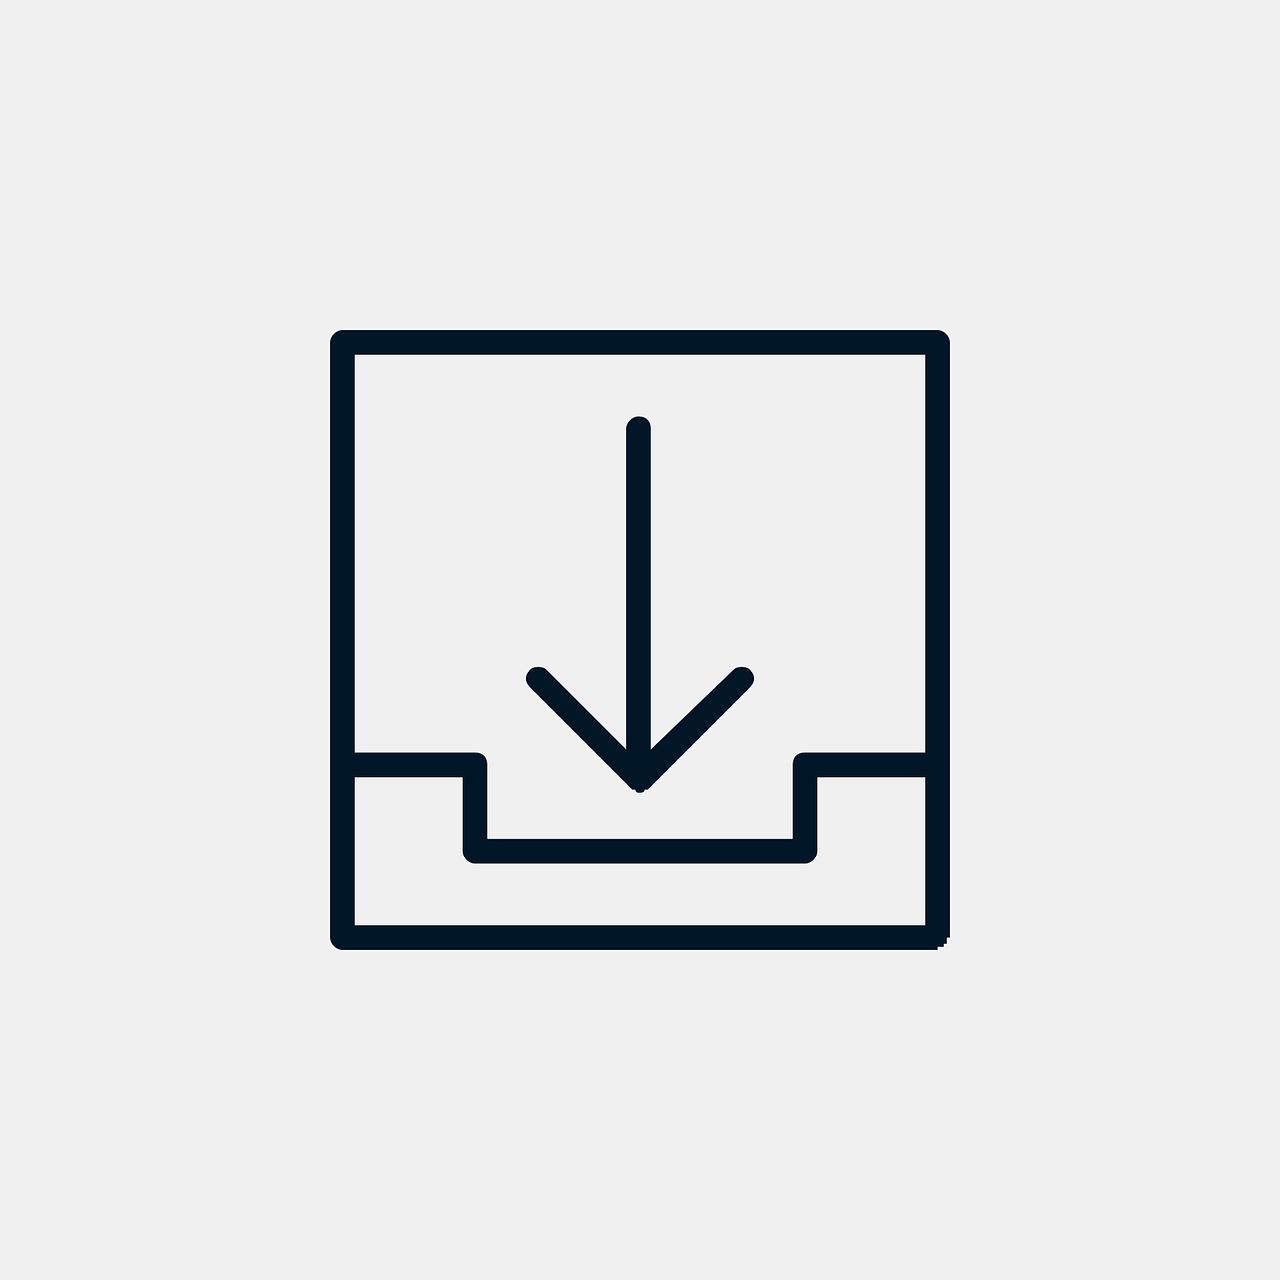 ChromeでTiddlyWikiを保存できない場合の対処方法 | Synapse Diary